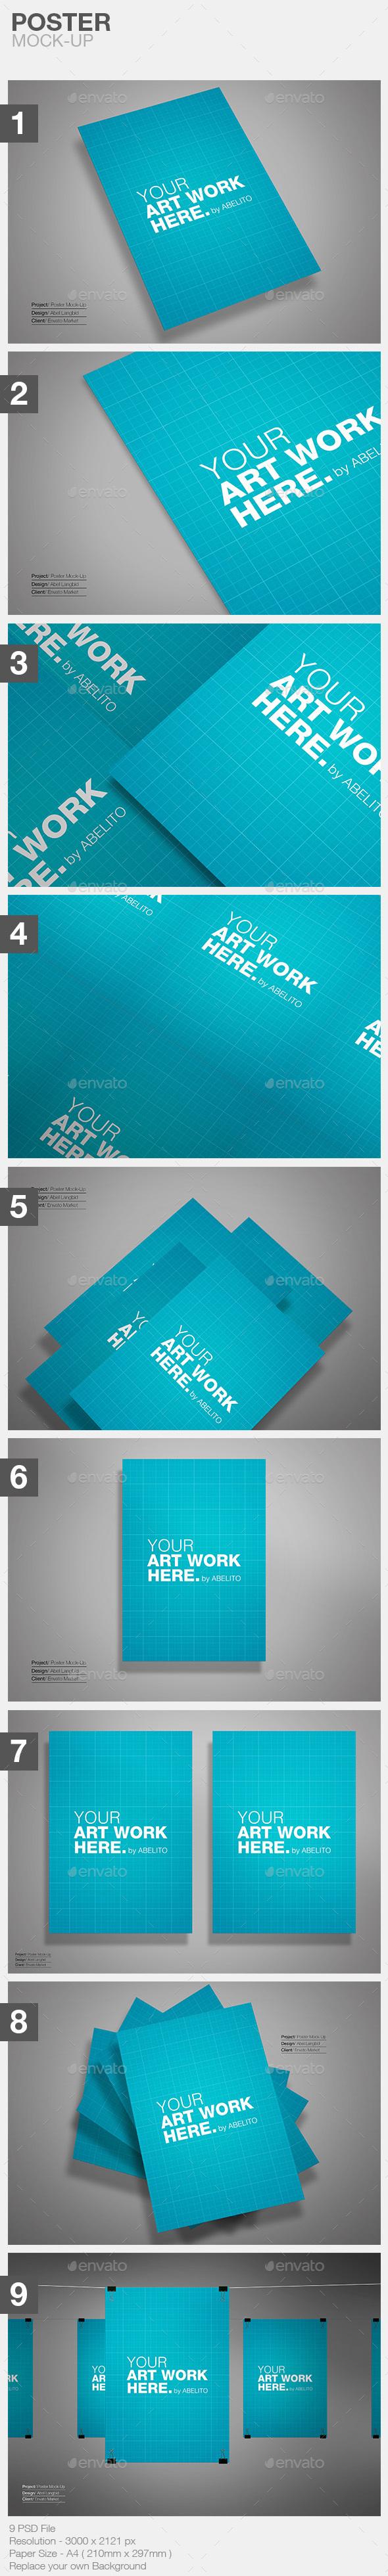 9 Poster Minimal Mockup - Flyers Print